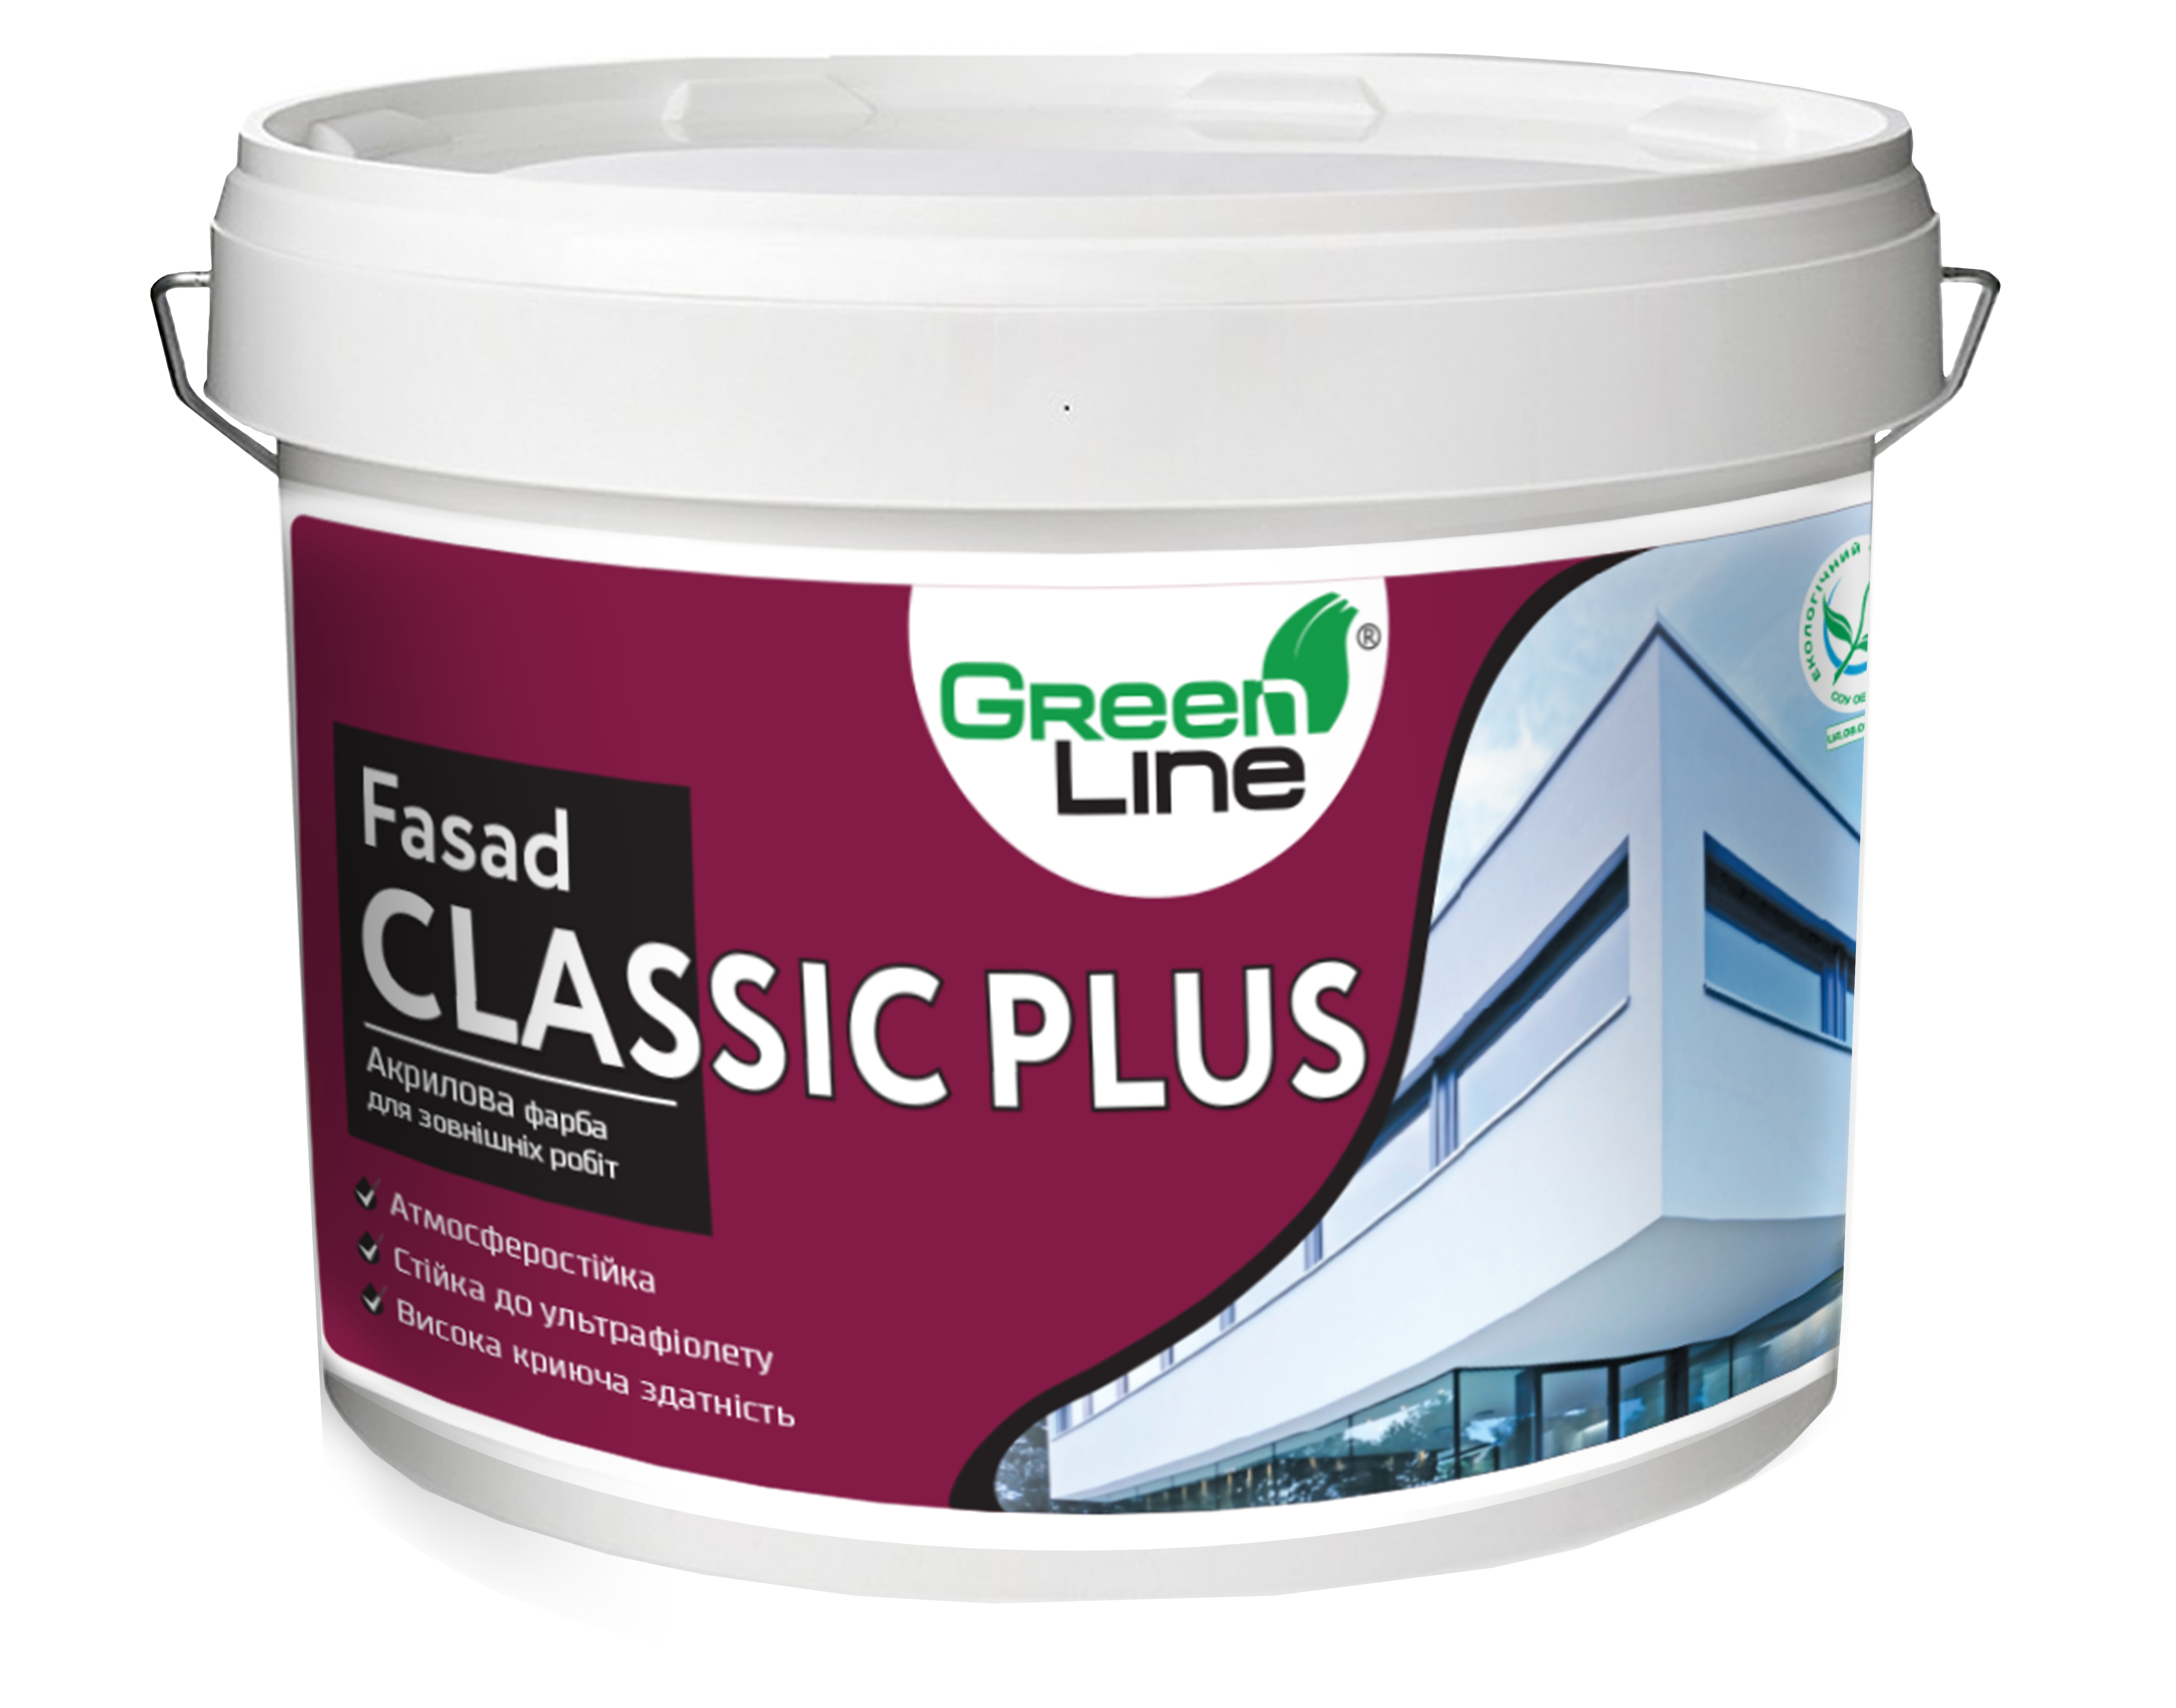 FASAD CLASSIC PLUS